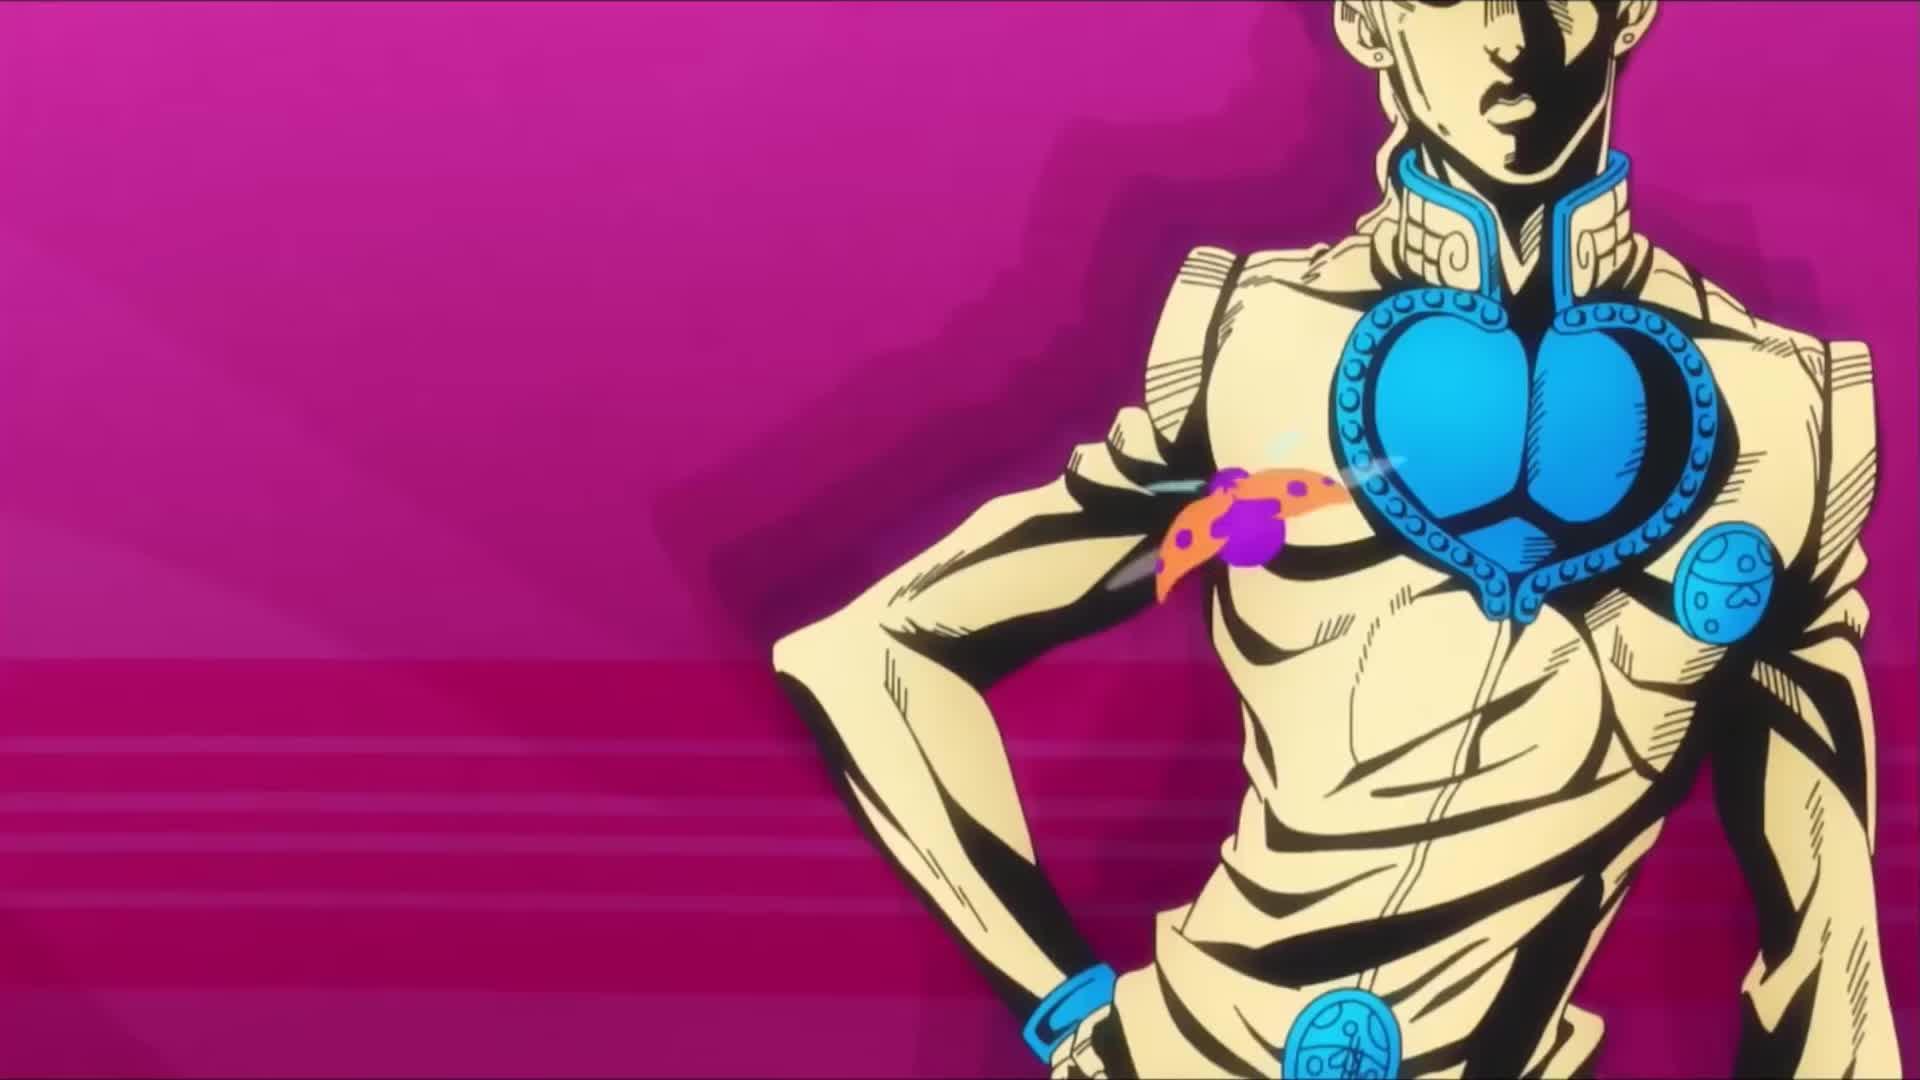 Jojo S Bizarre Adventure Golden Wind Anime Pv Gif Gfycat